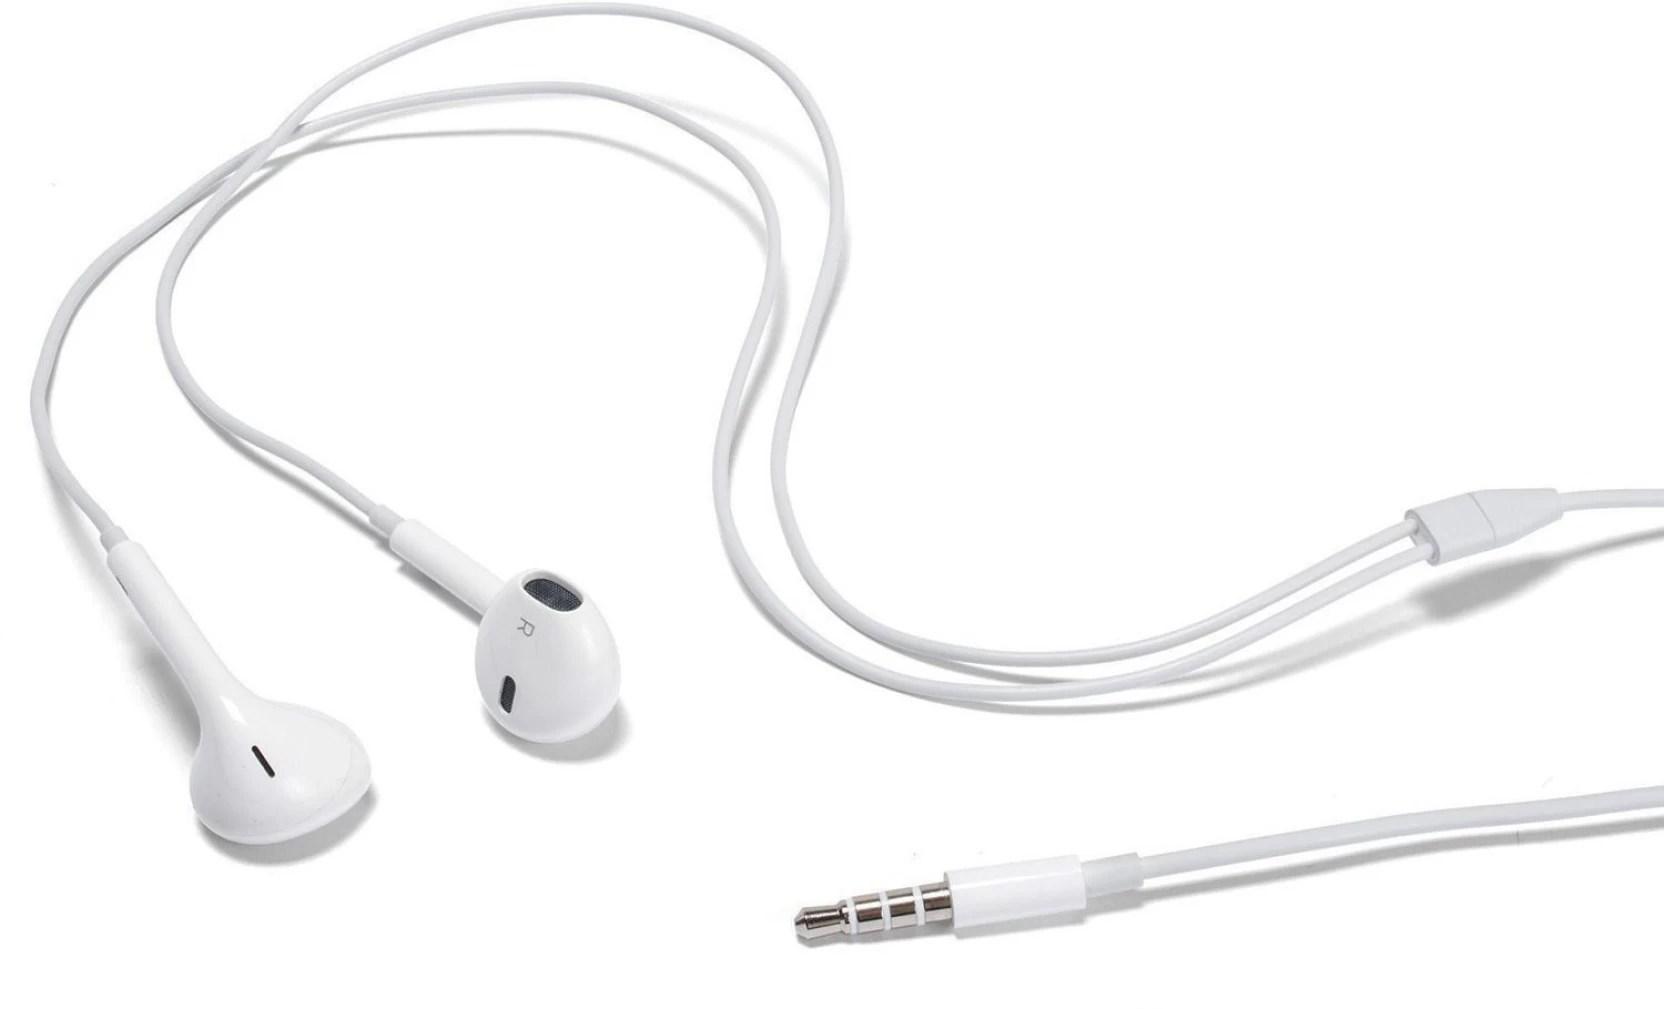 digitalmart premium quality high selling earphone for apple iphone 5 5s 5c 6 6s 6plus 6splus 7 7plus ipad ipod wired headset with mic headphone white  [ 1664 x 1009 Pixel ]